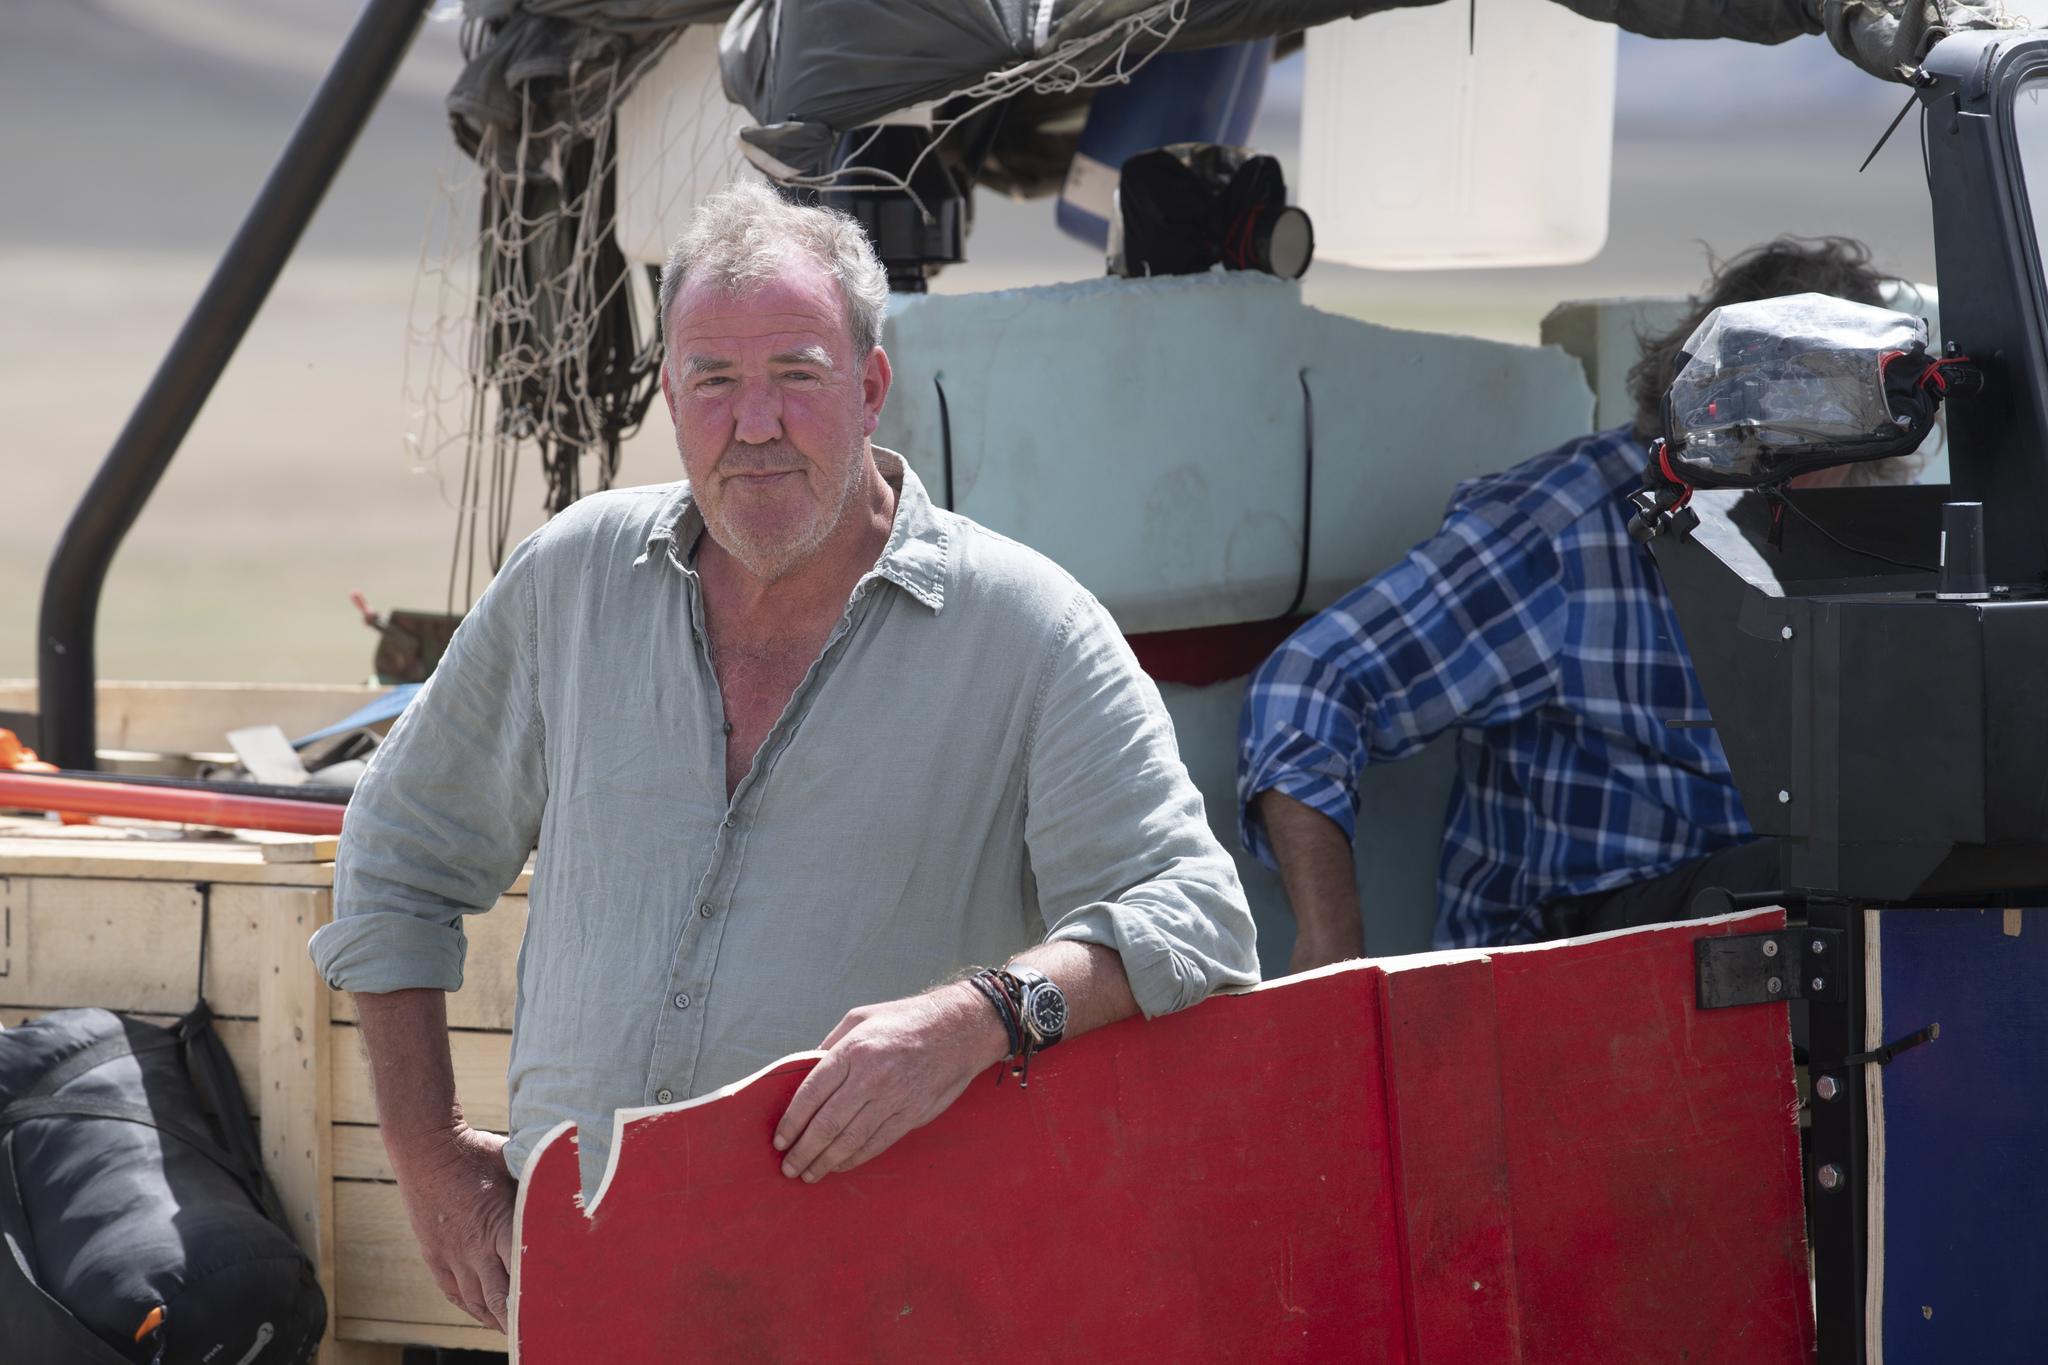 Jeremy Clarkson on The Grand Tour season 3 finale